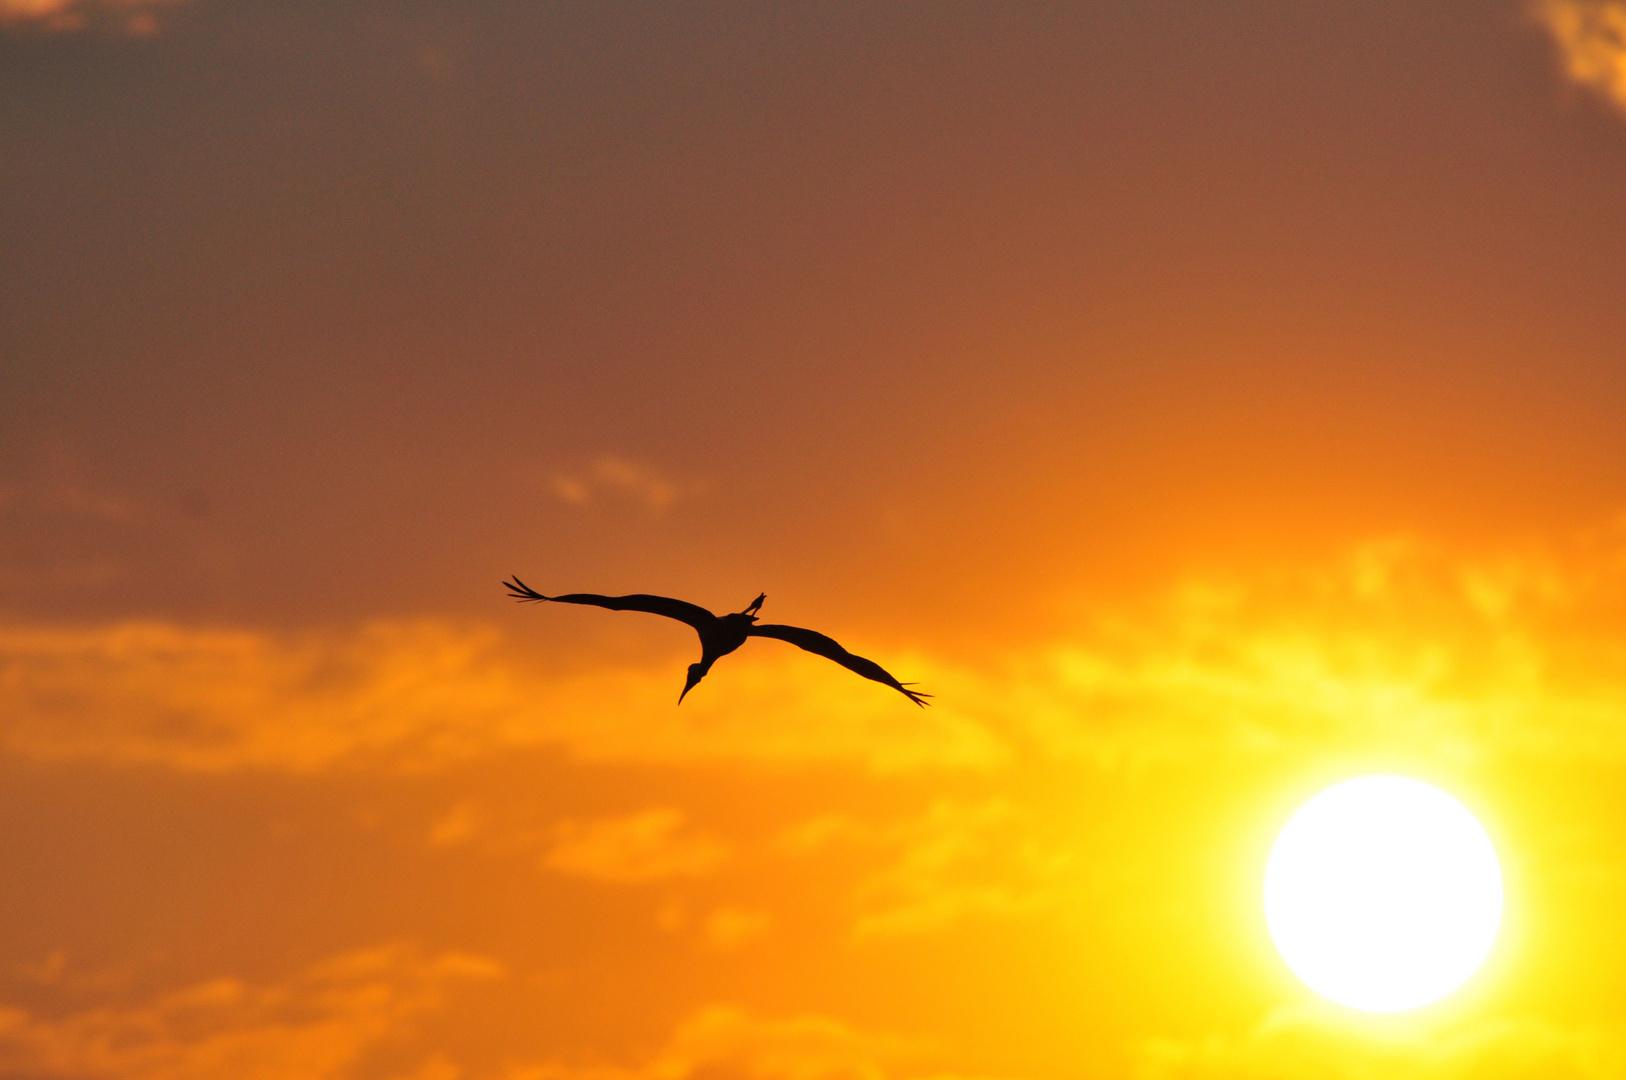 Der Flug des Reihers